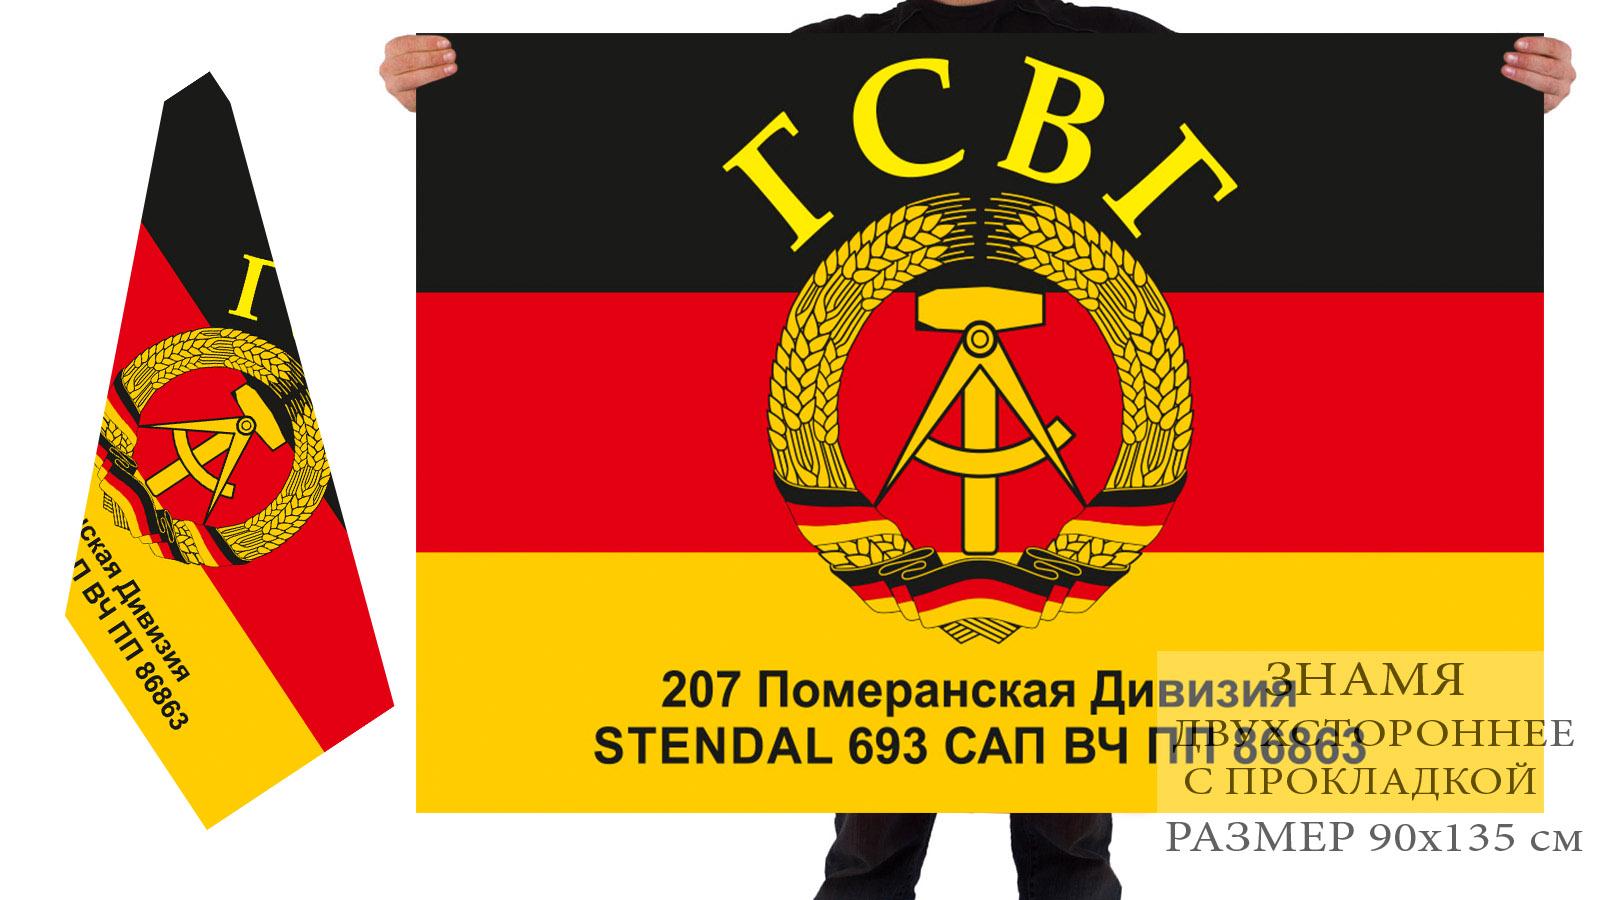 Двусторонний флаг 693 САП 207 Померанской дивизии